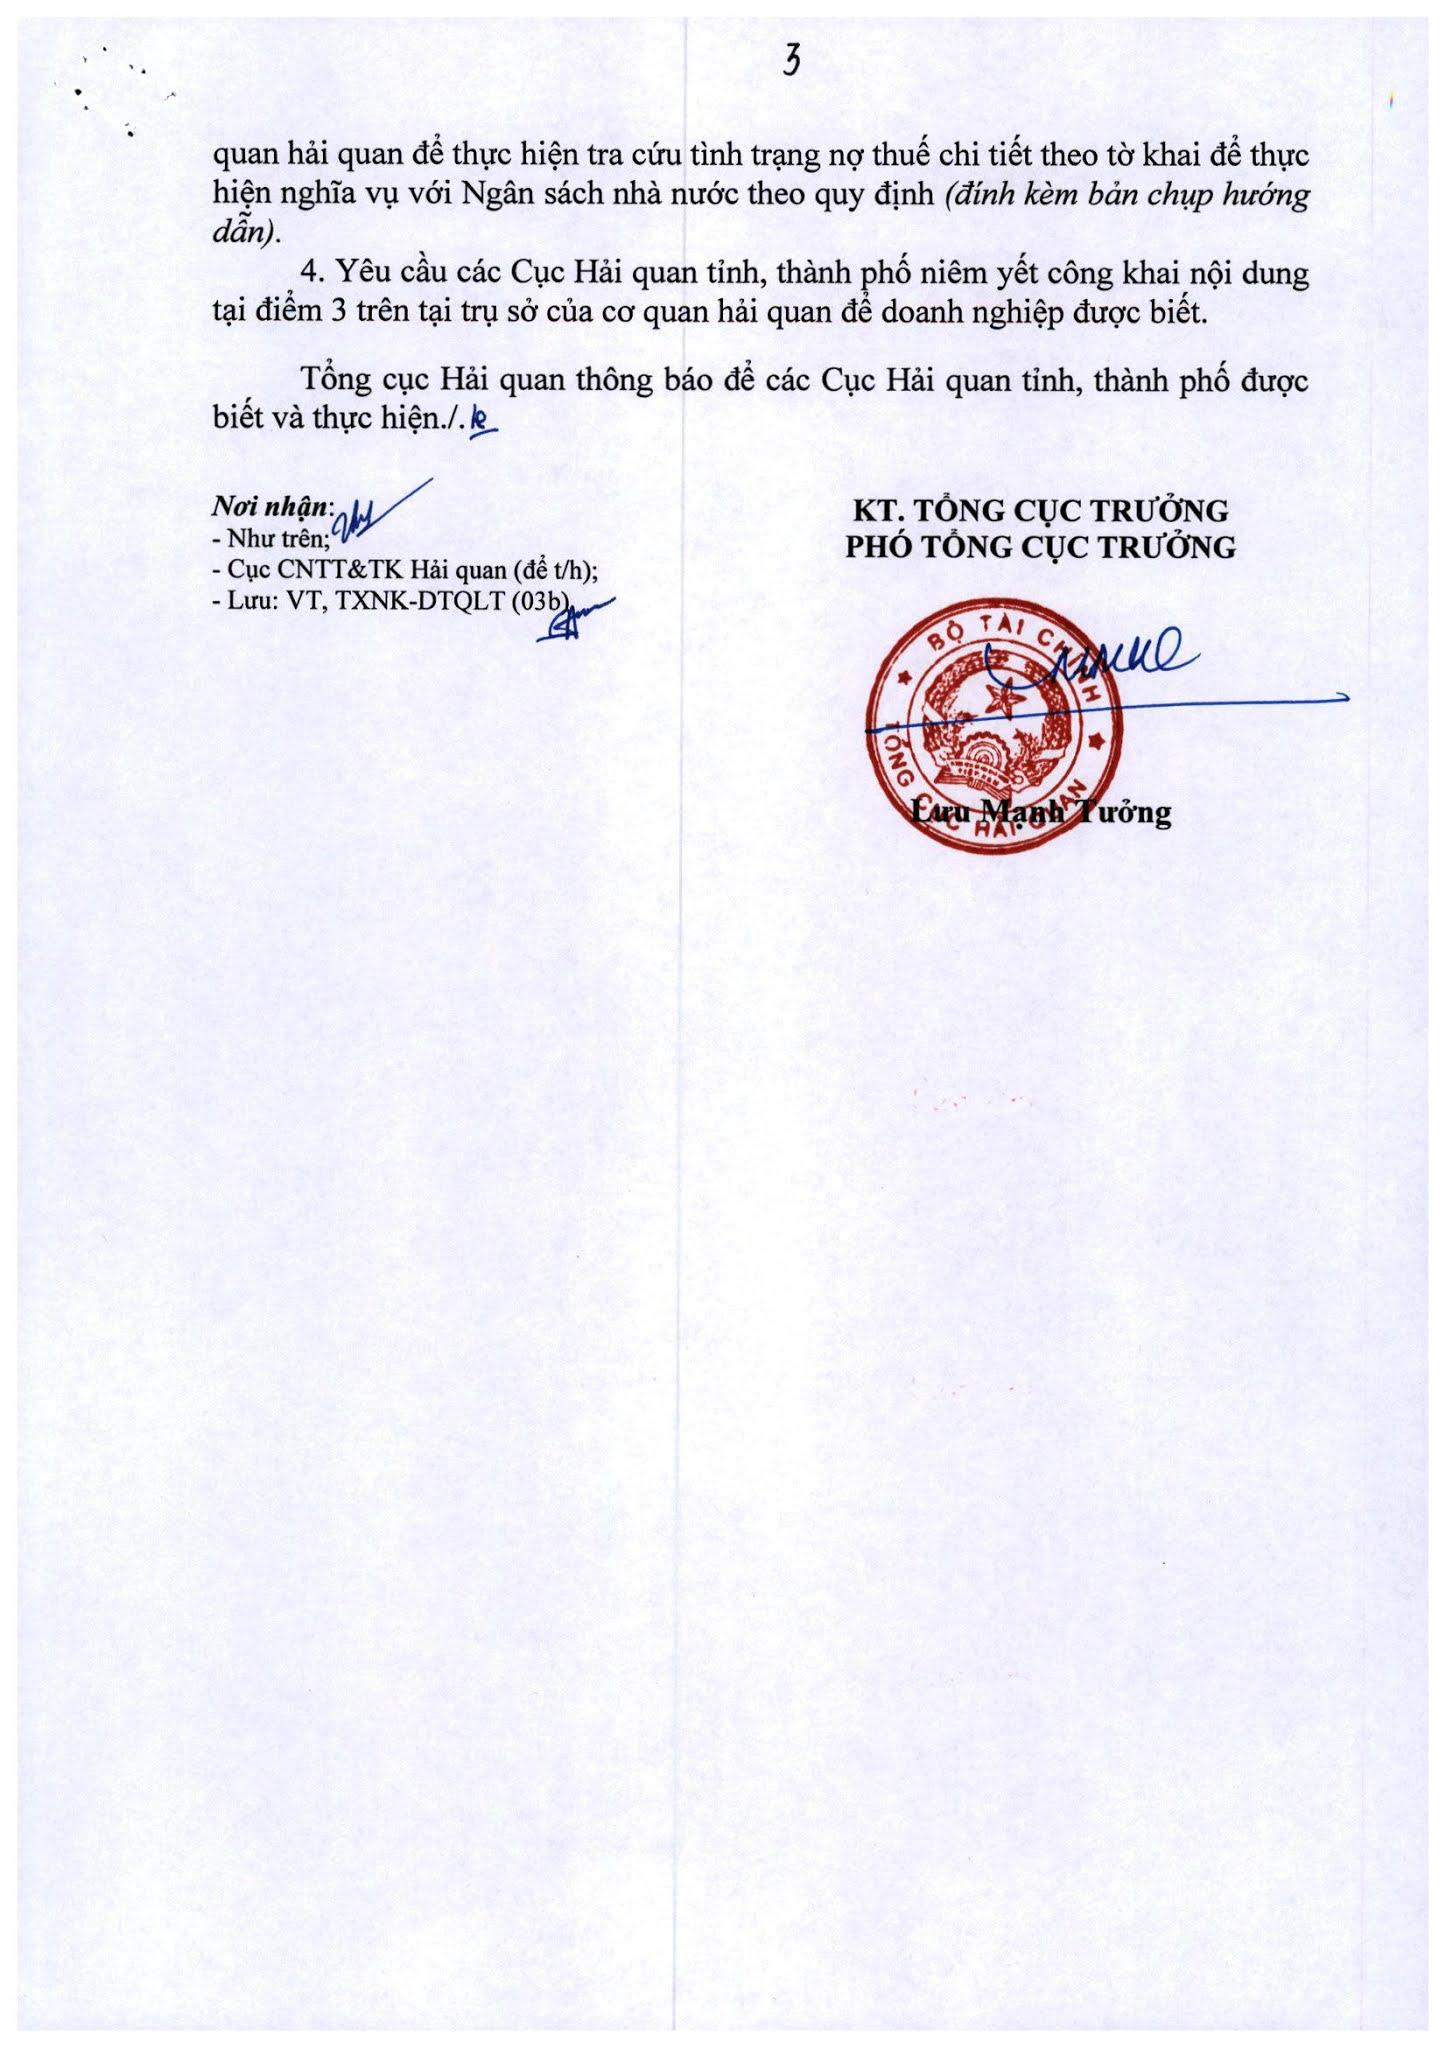 [Image: 210614_2893_TCHQ-TXNK_haiquanvietnam_03.jpg]